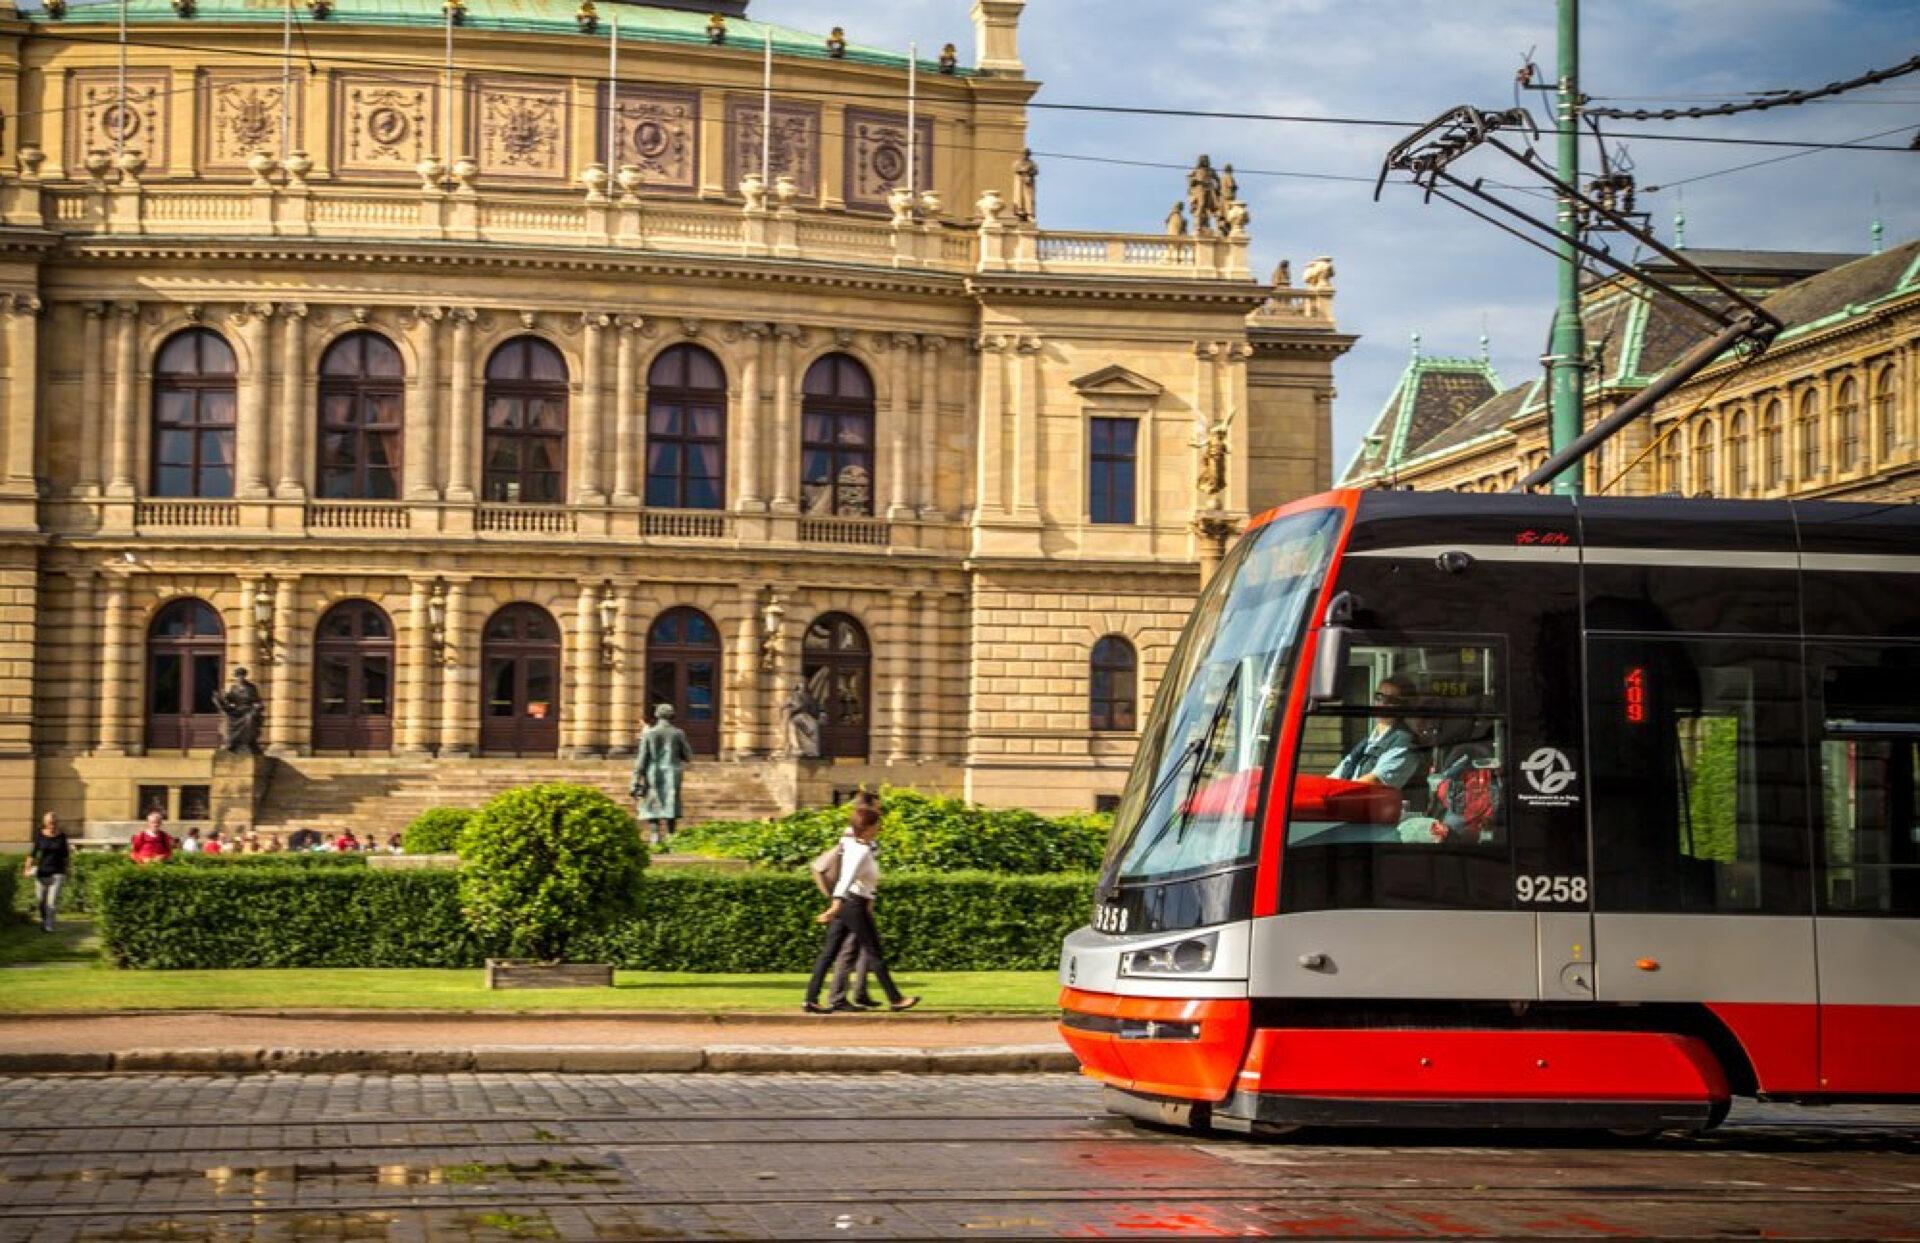 Прага глазами новичка